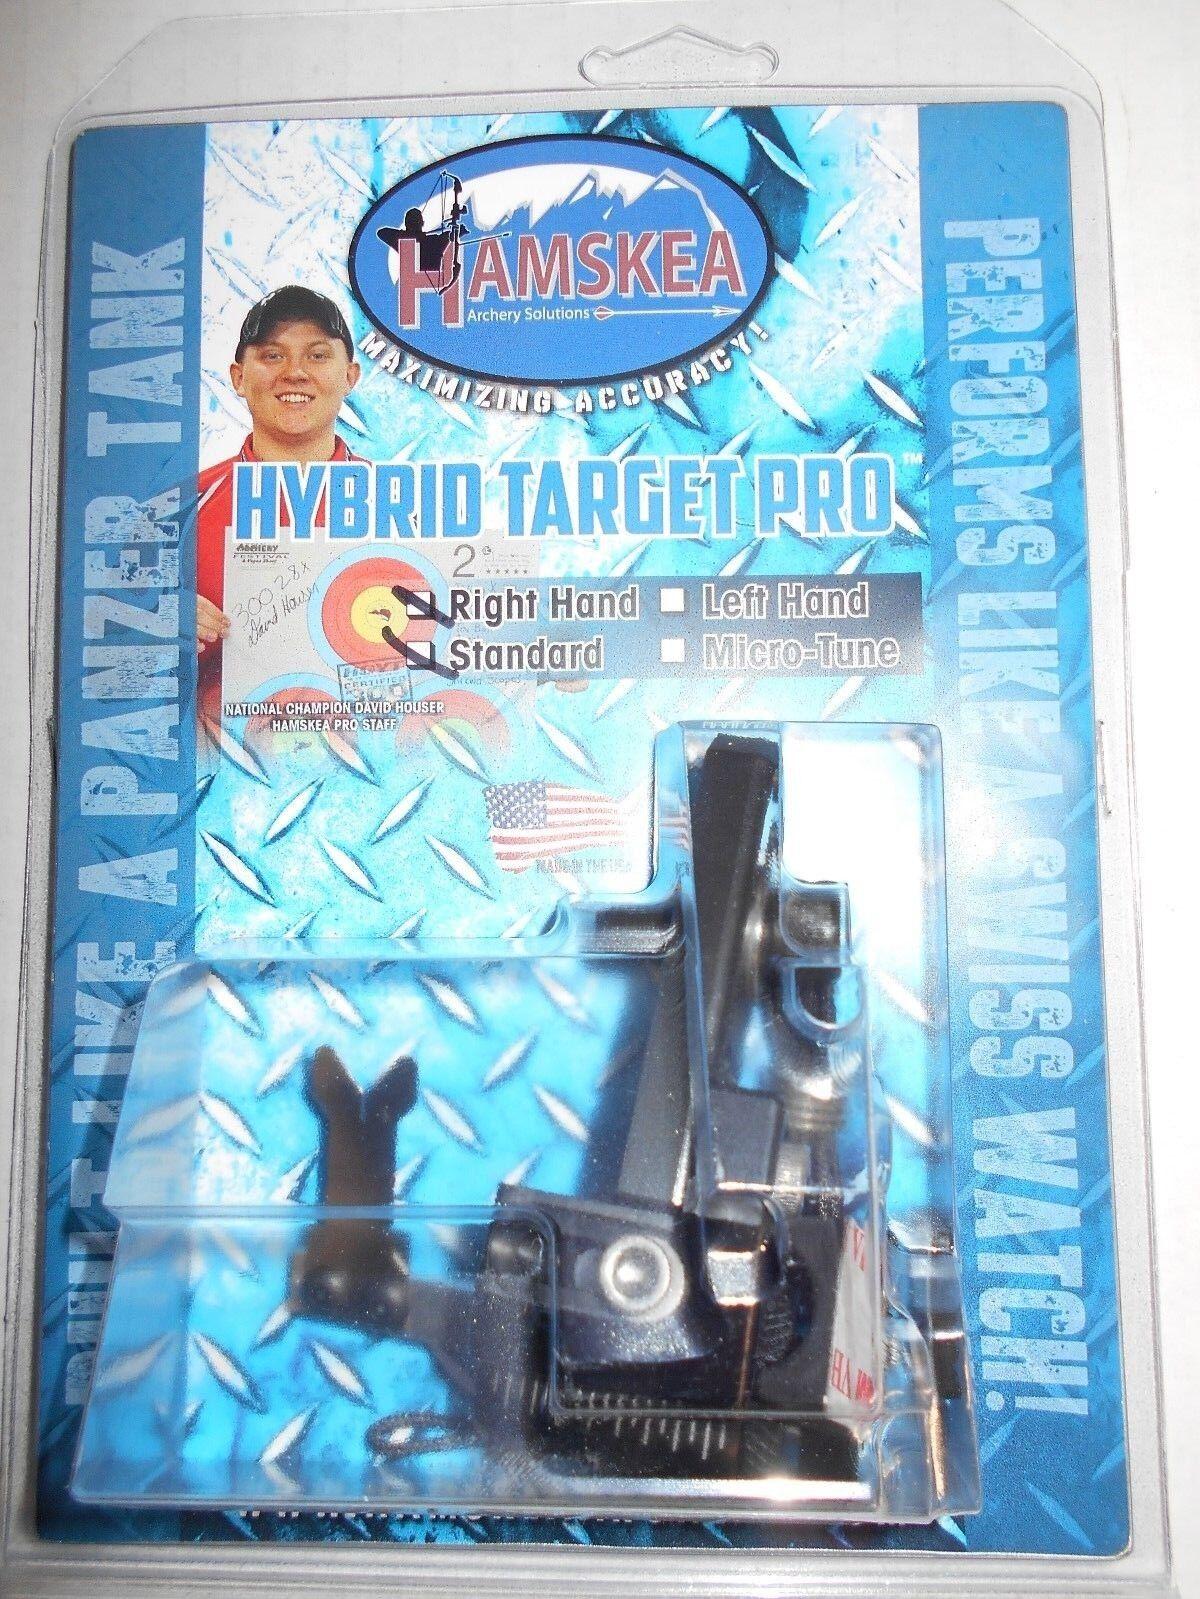 @NEW @ hamskea híbrido Target Pro Estándar Fall-lejos resto De Flecha  200072 RH Negro